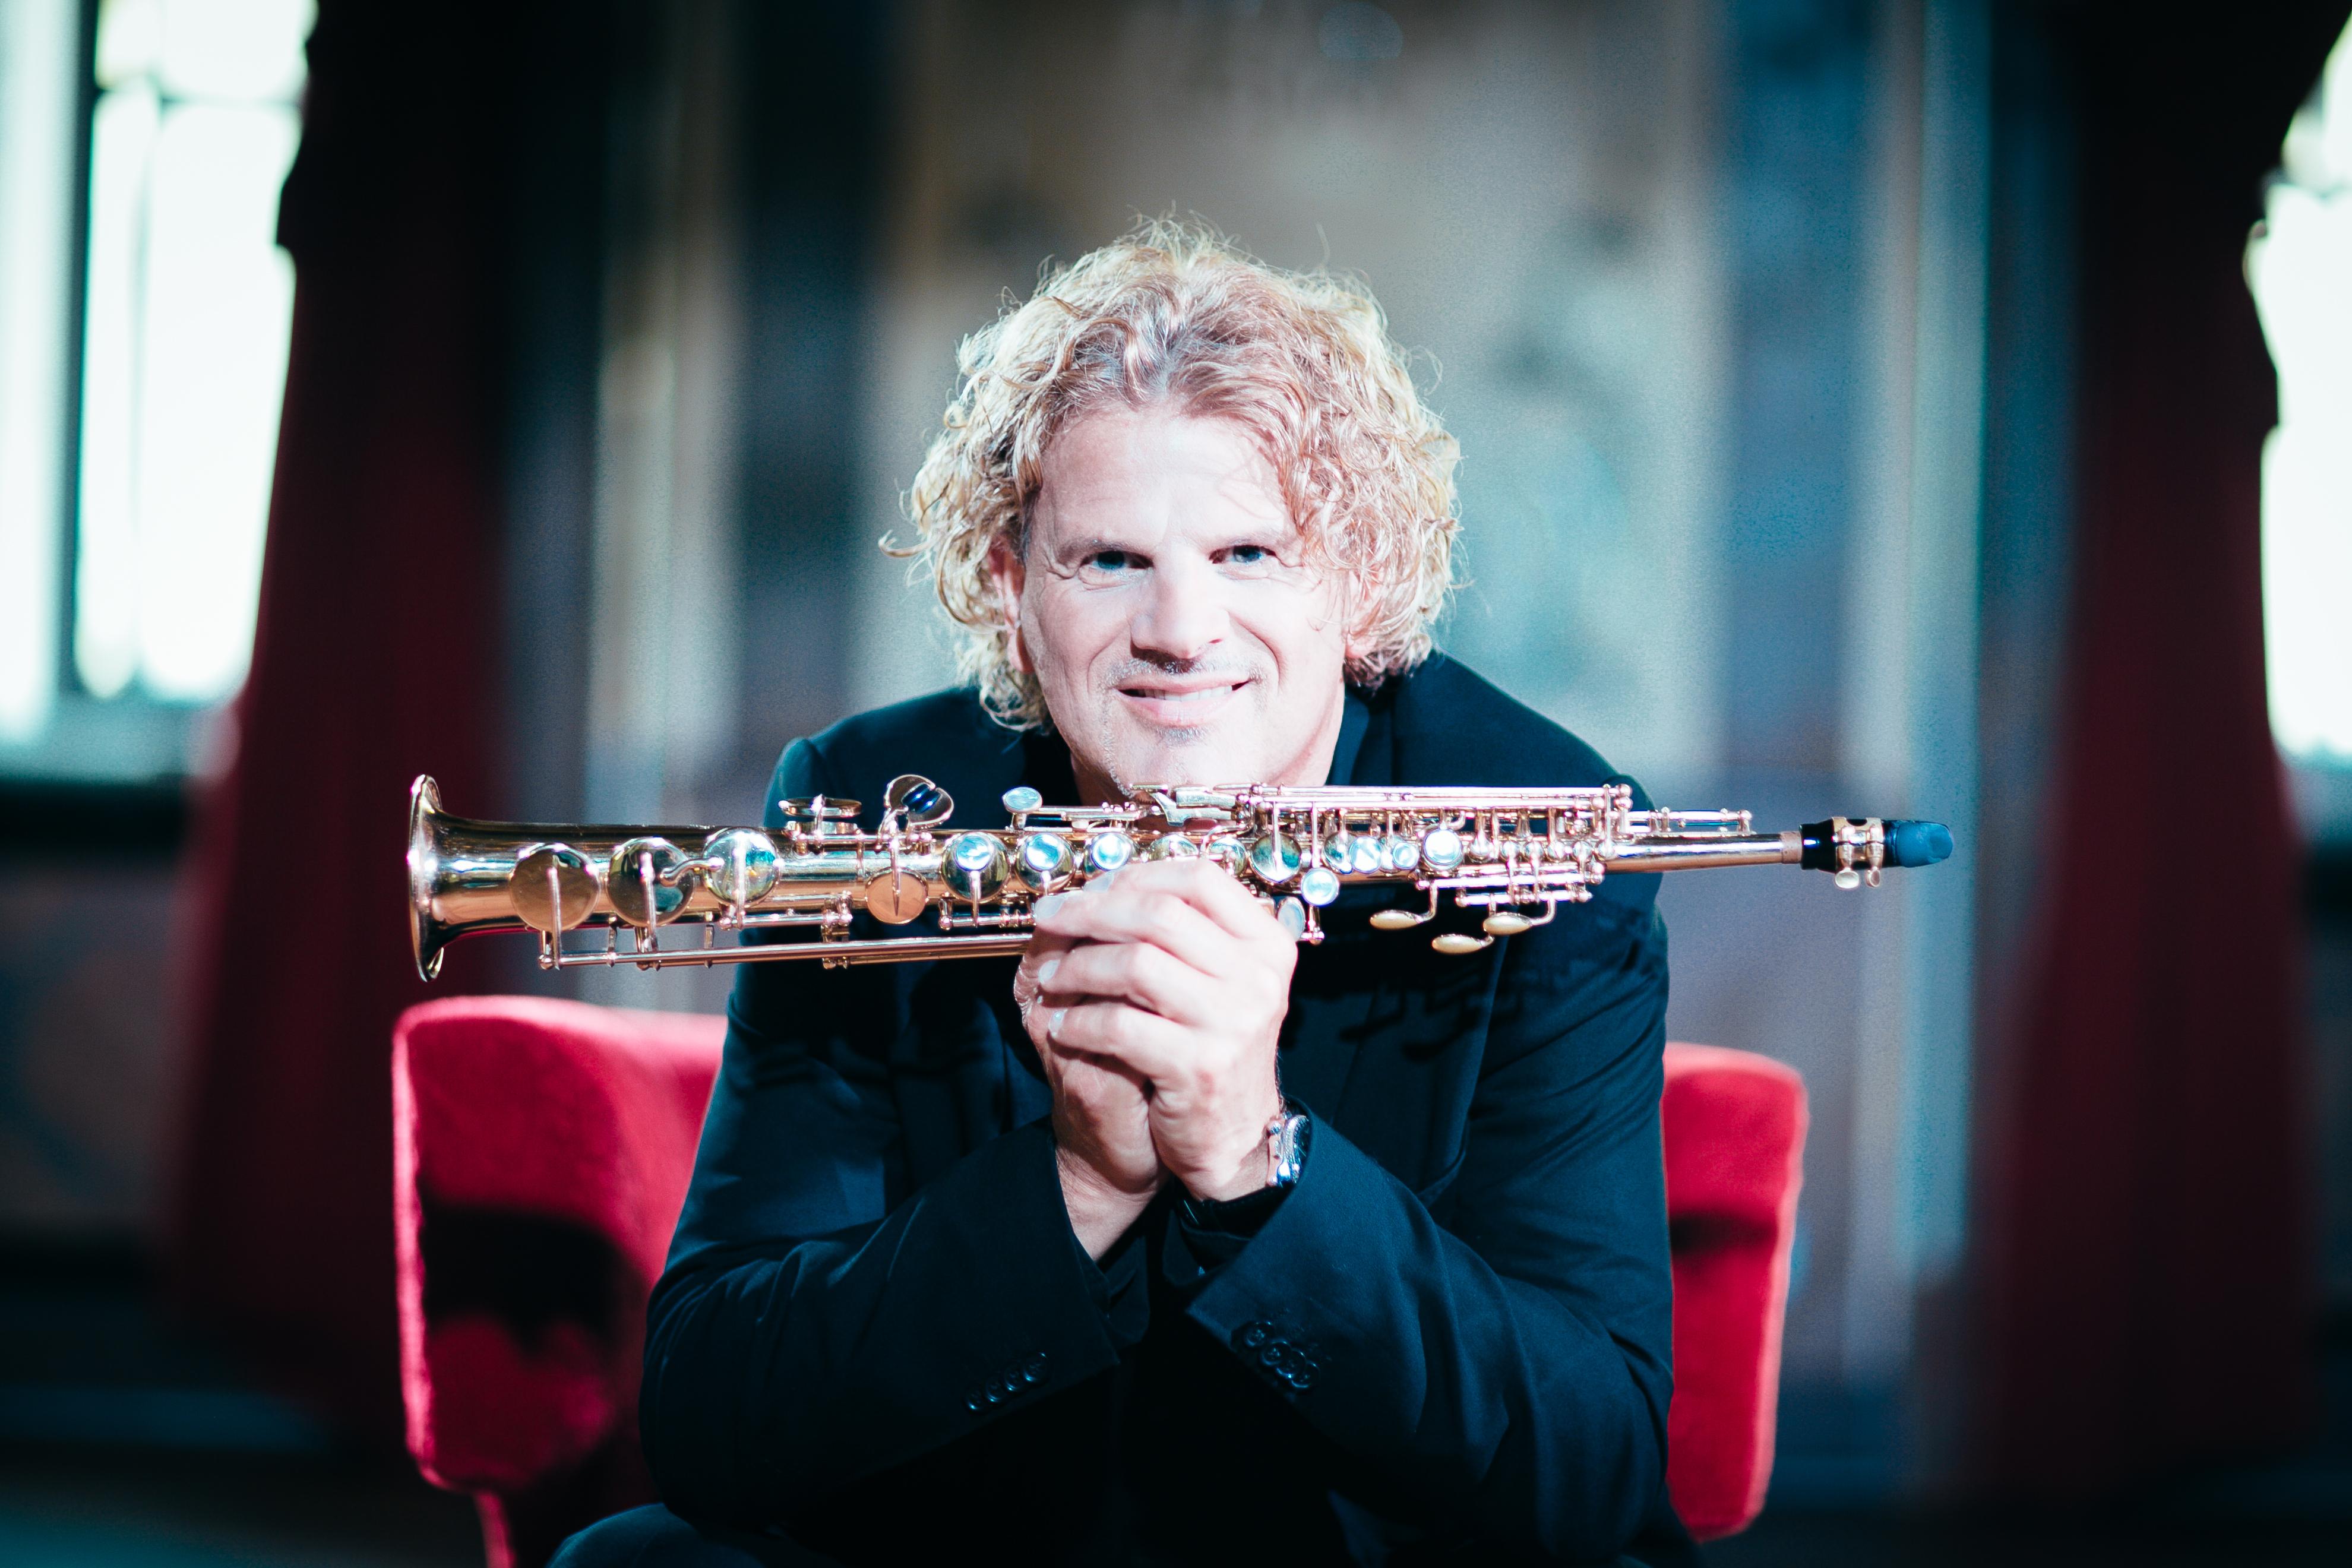 Saxophonist Chris Haller